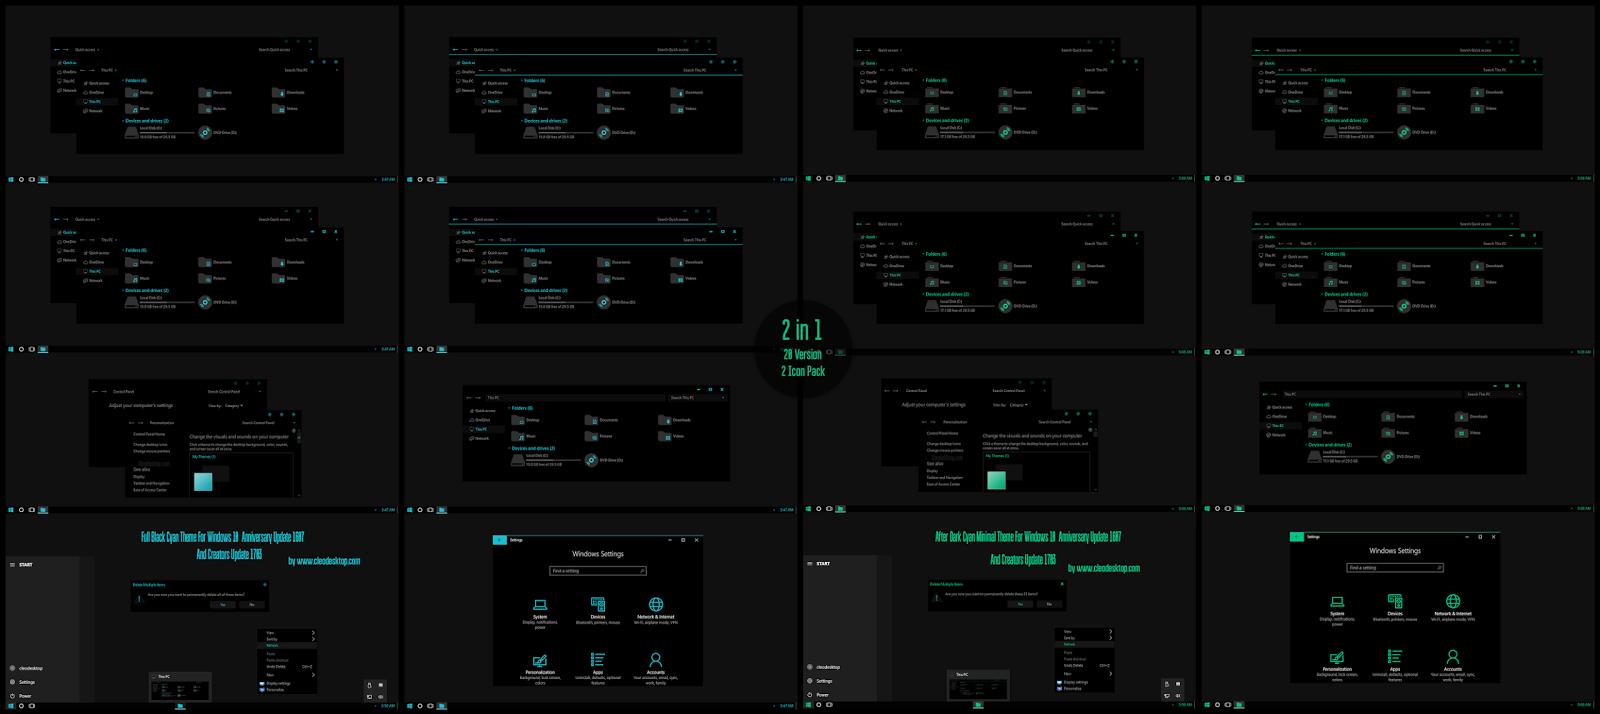 Windows10 Themes I Cleodesktop: Full Black Cyan and Green